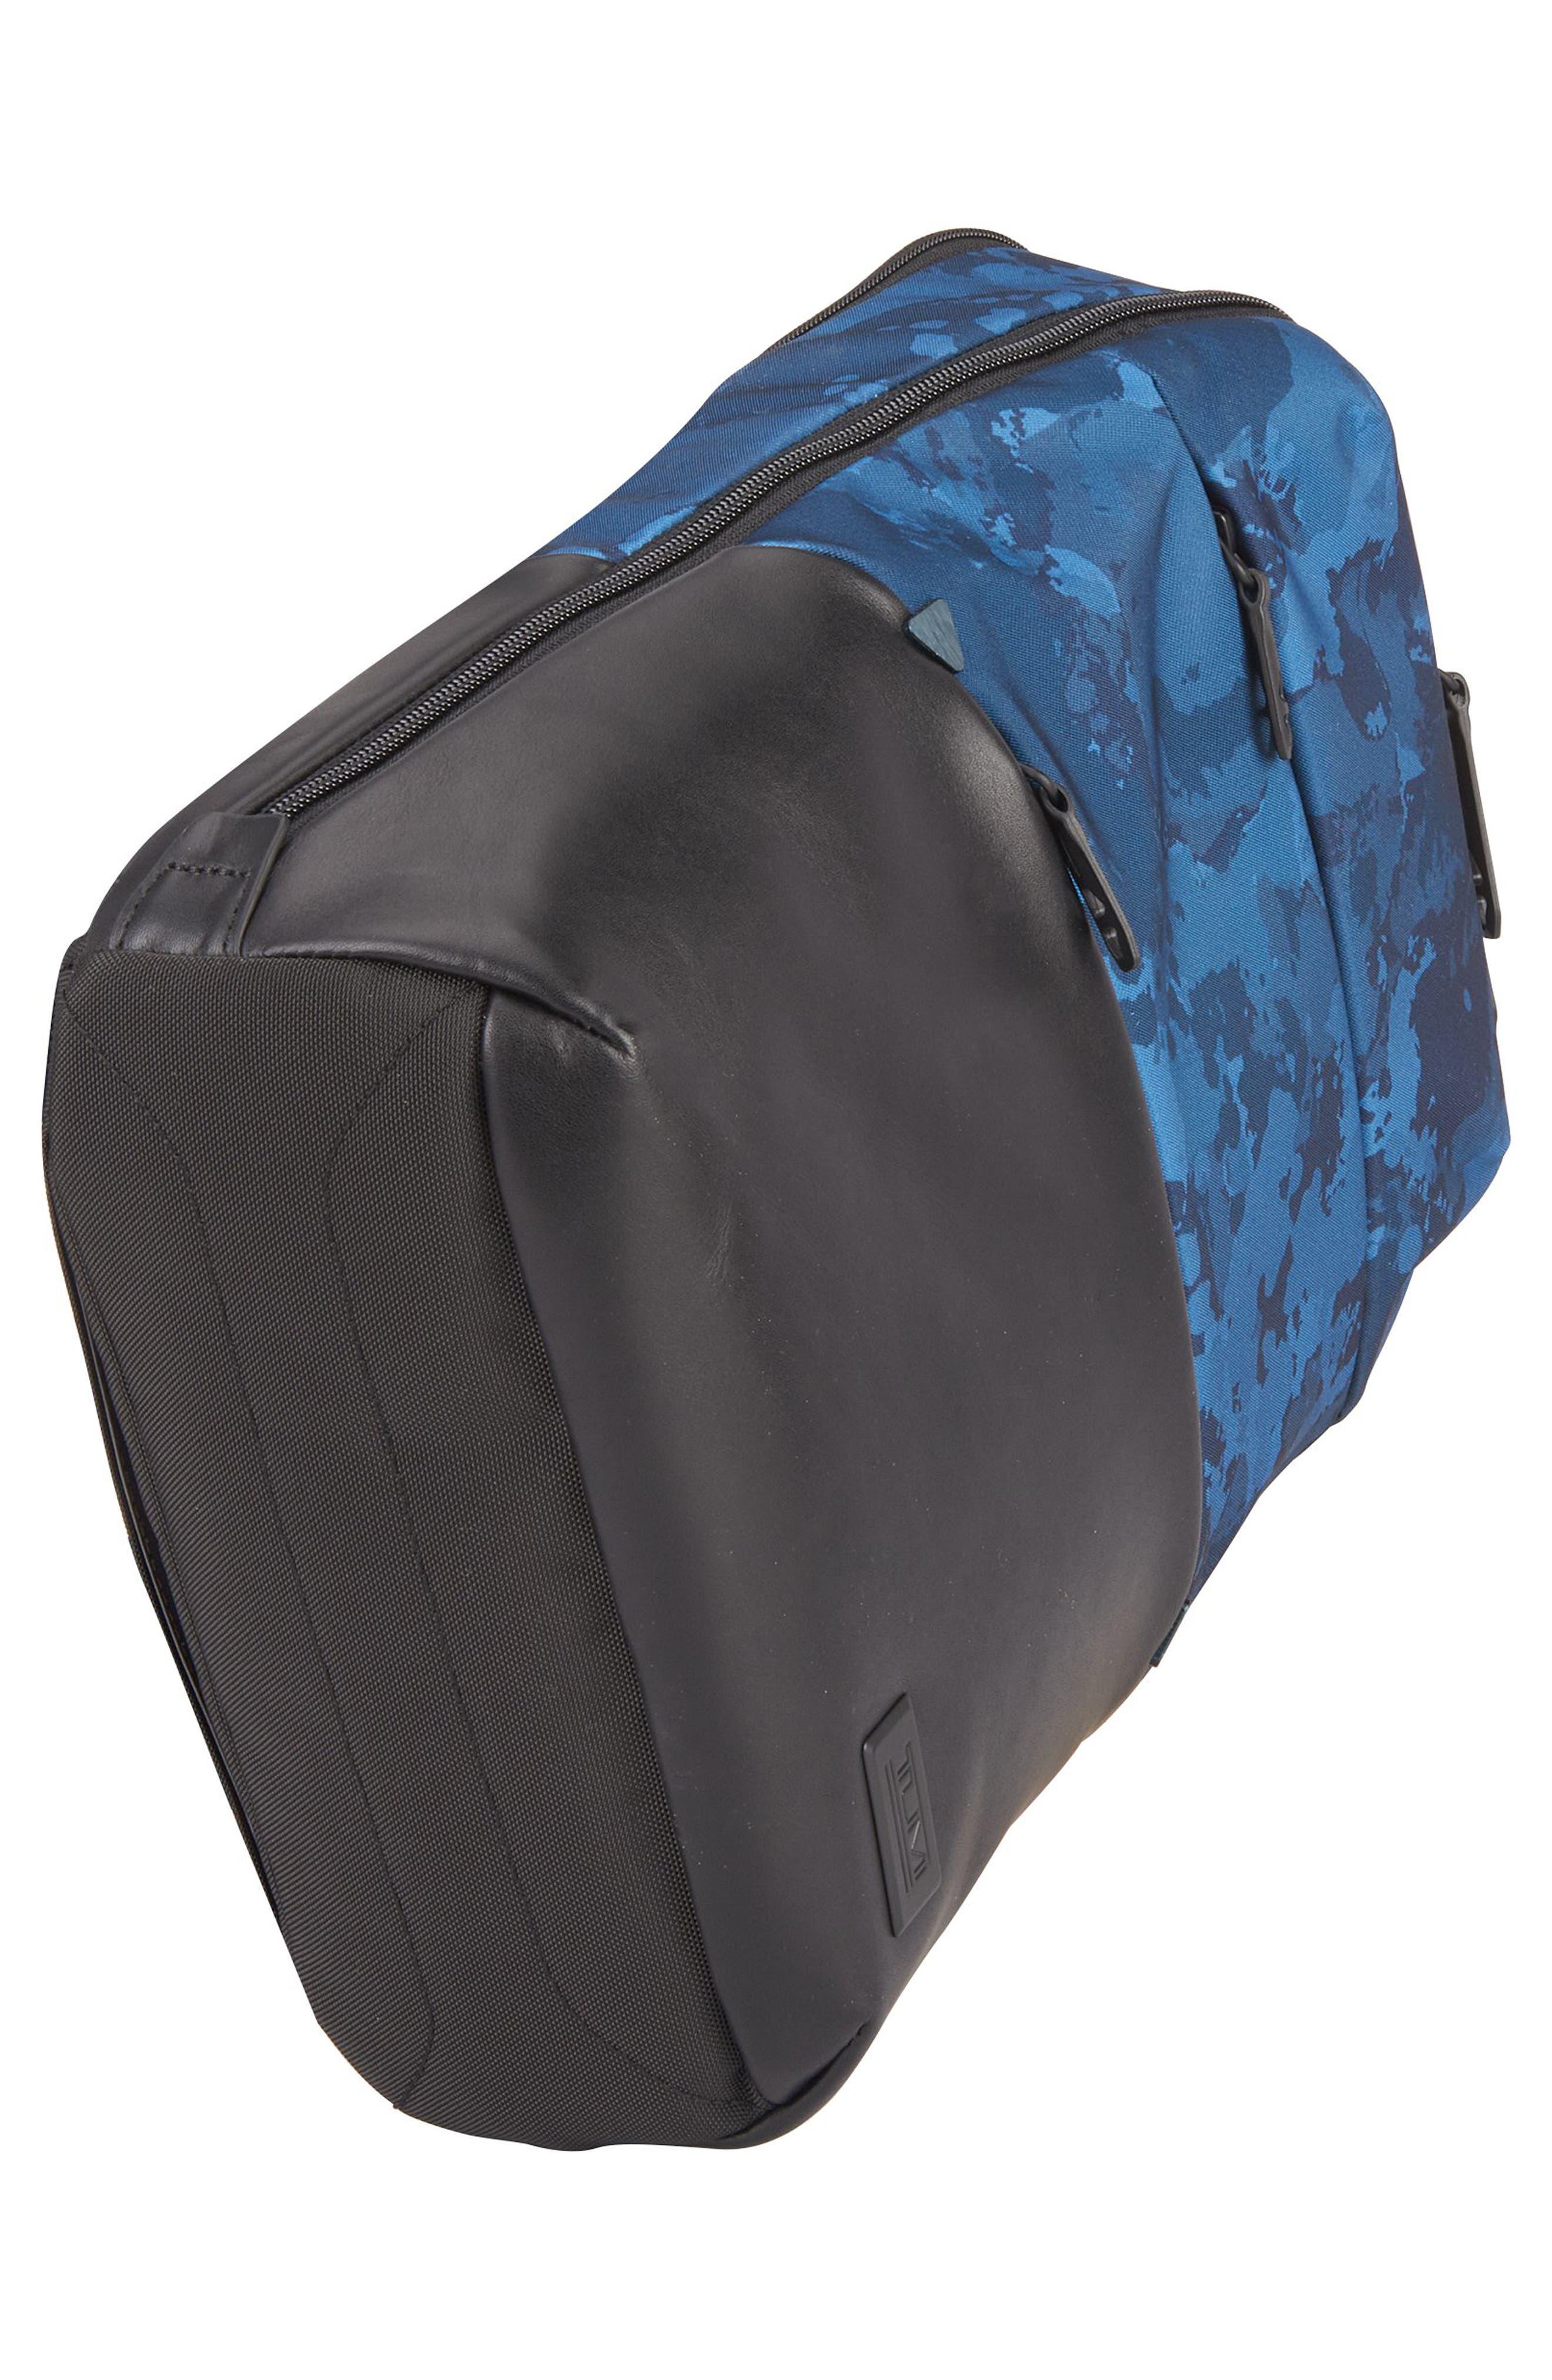 Tahoe - Elwood Backpack,                             Alternate thumbnail 3, color,                             430